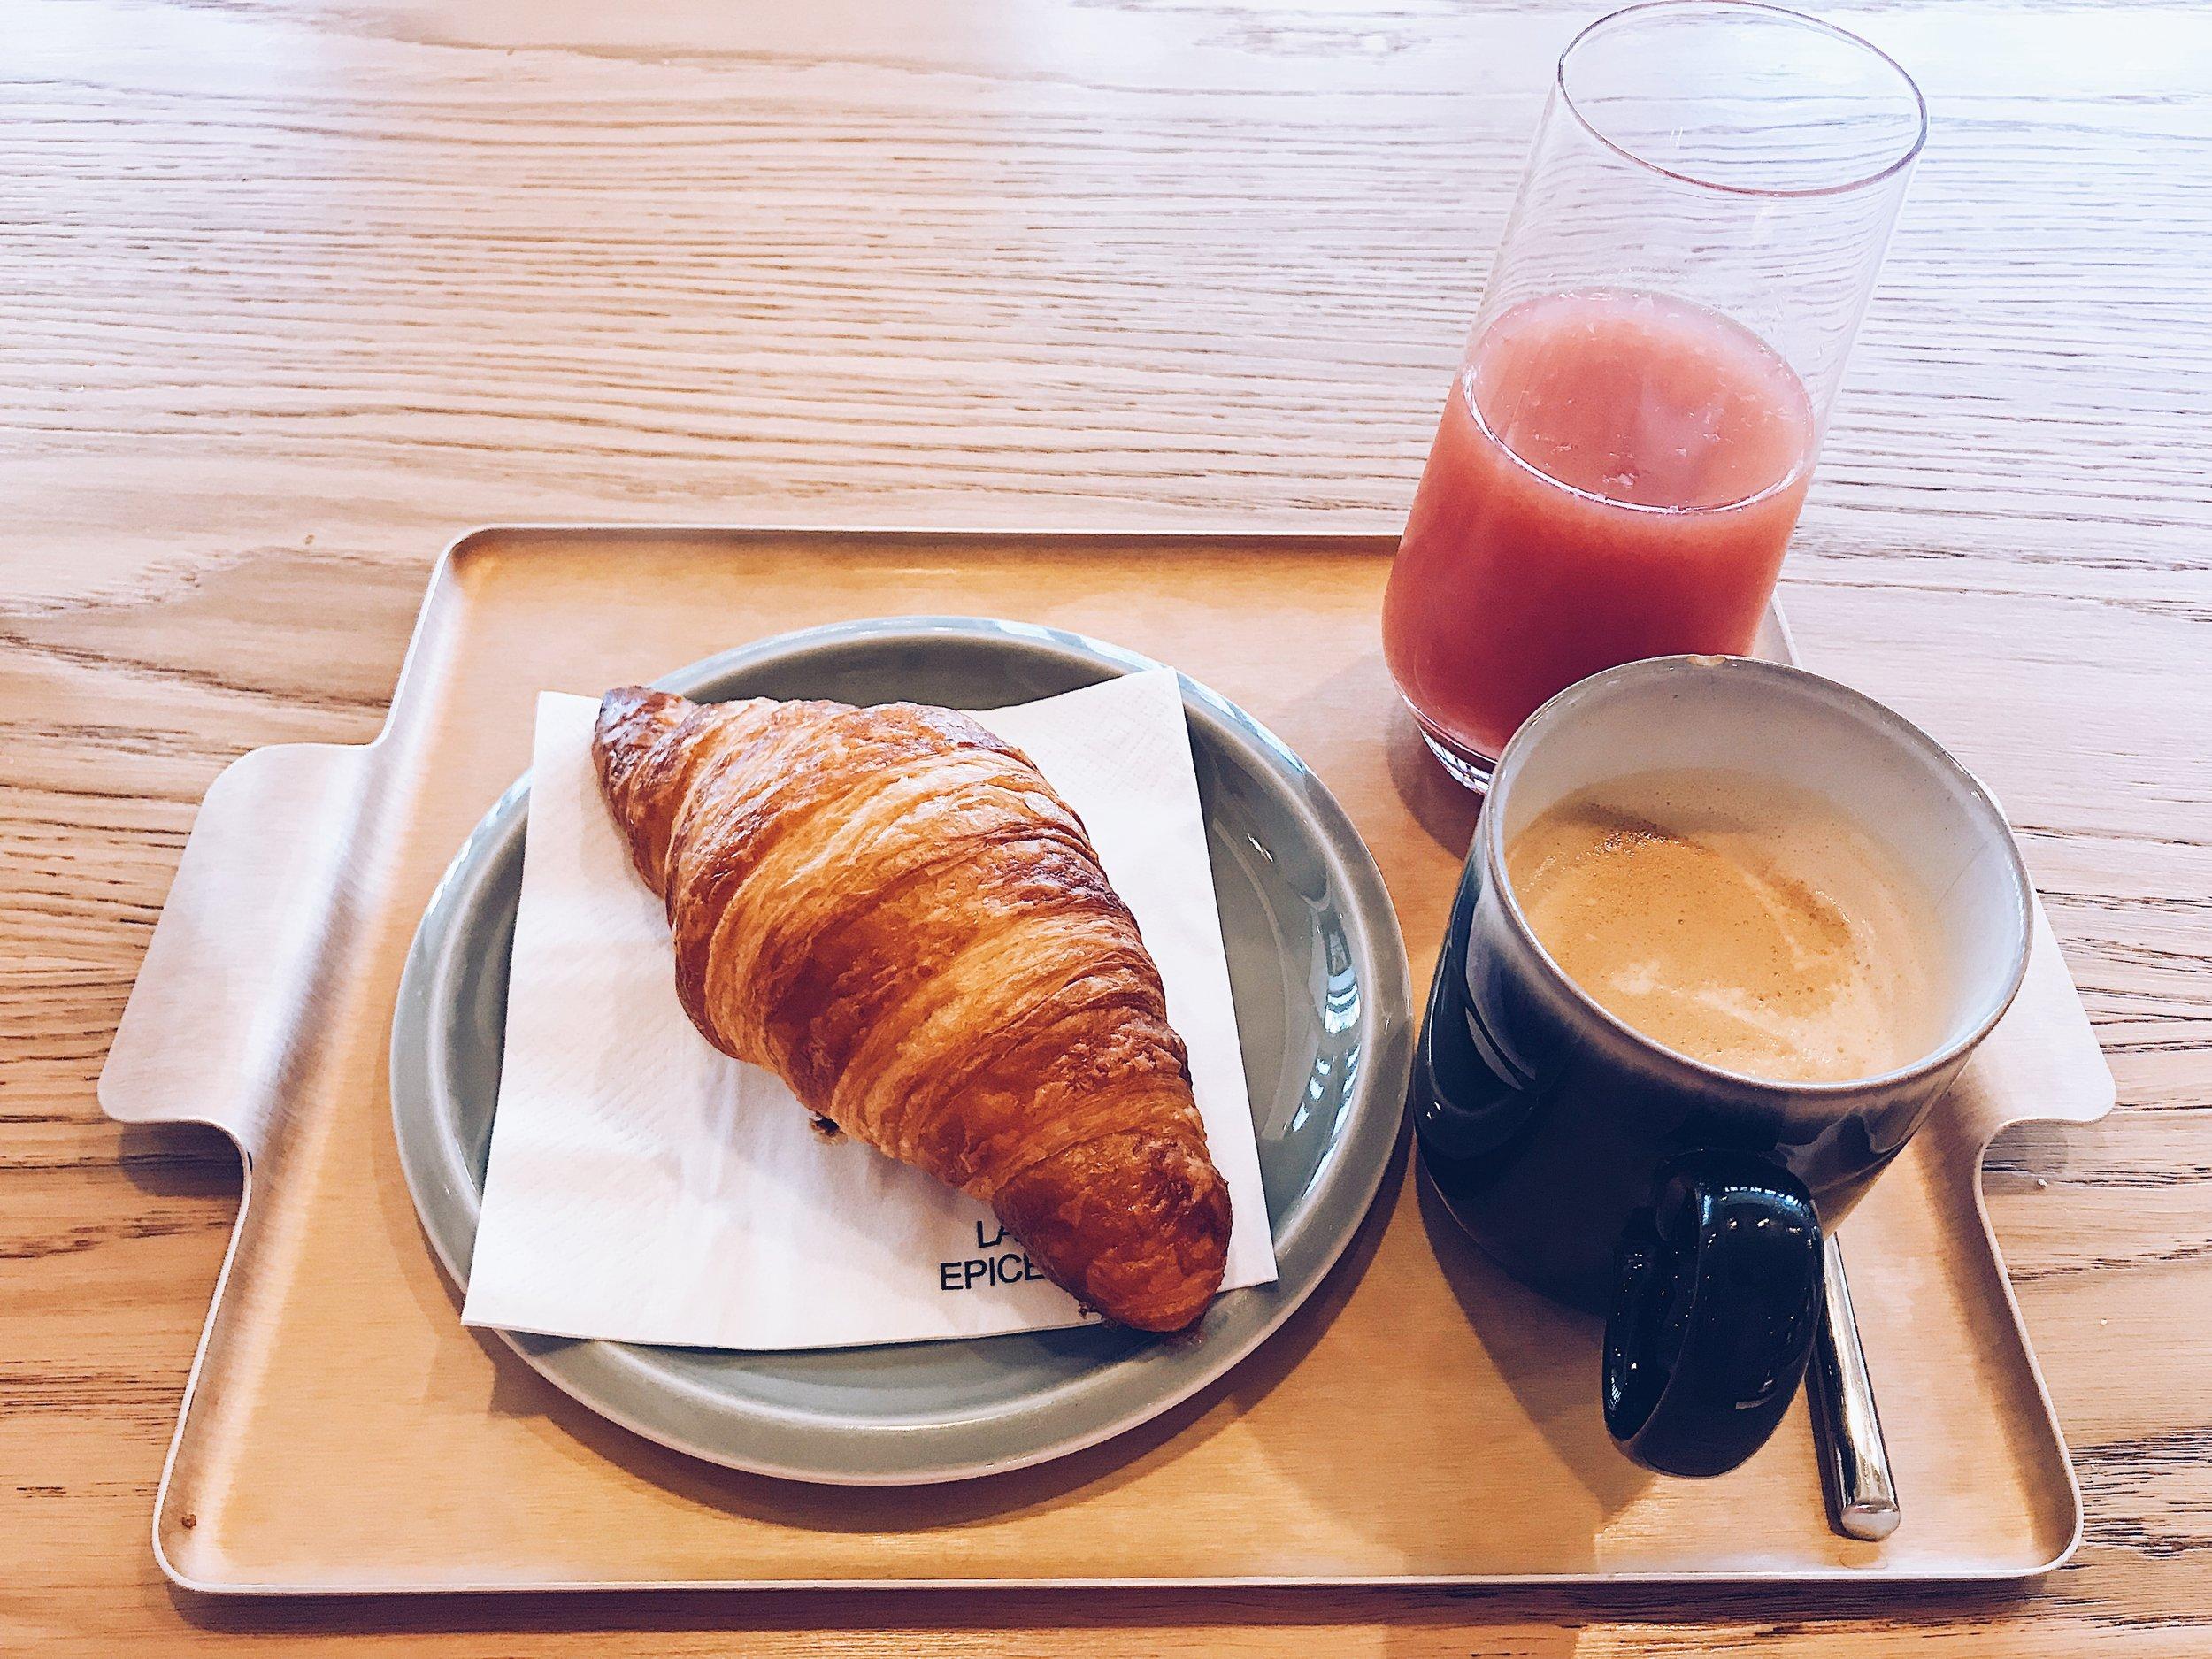 Petit dejeuner Grande epicerie Paris Passy